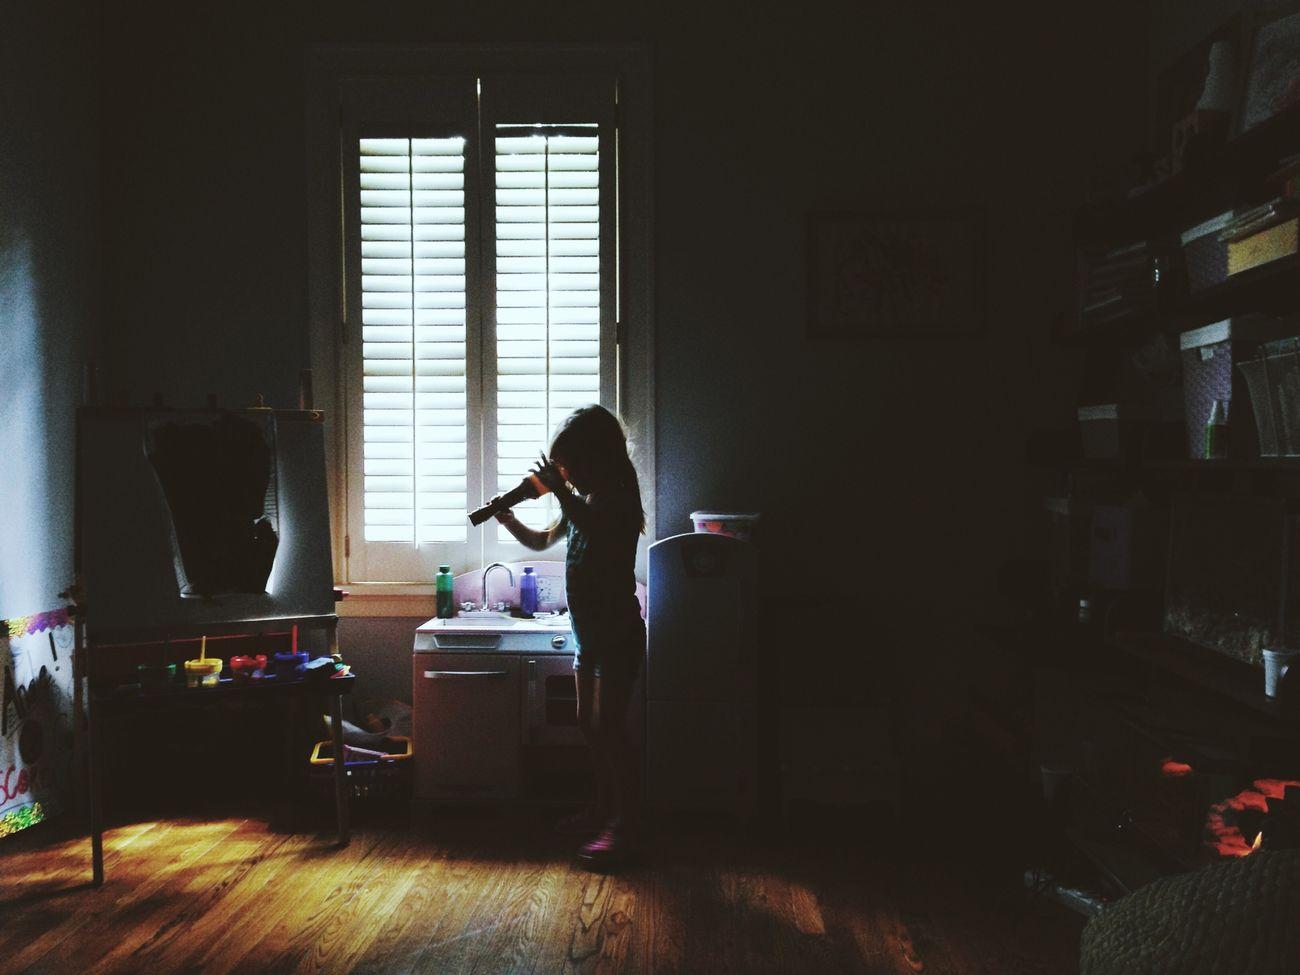 indoors, sitting, window, lifestyles, home interior